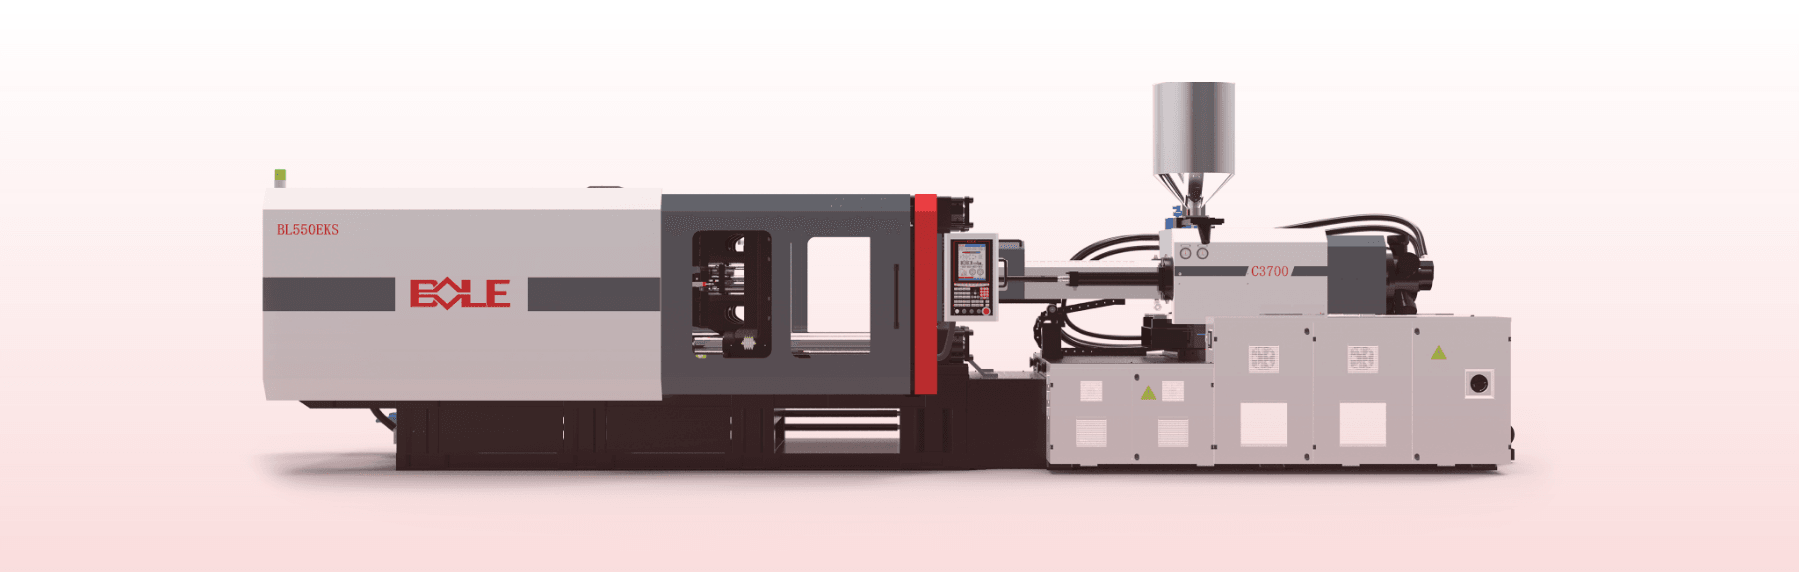 Bole Machinery Injection Moulding Machine Manufacturer